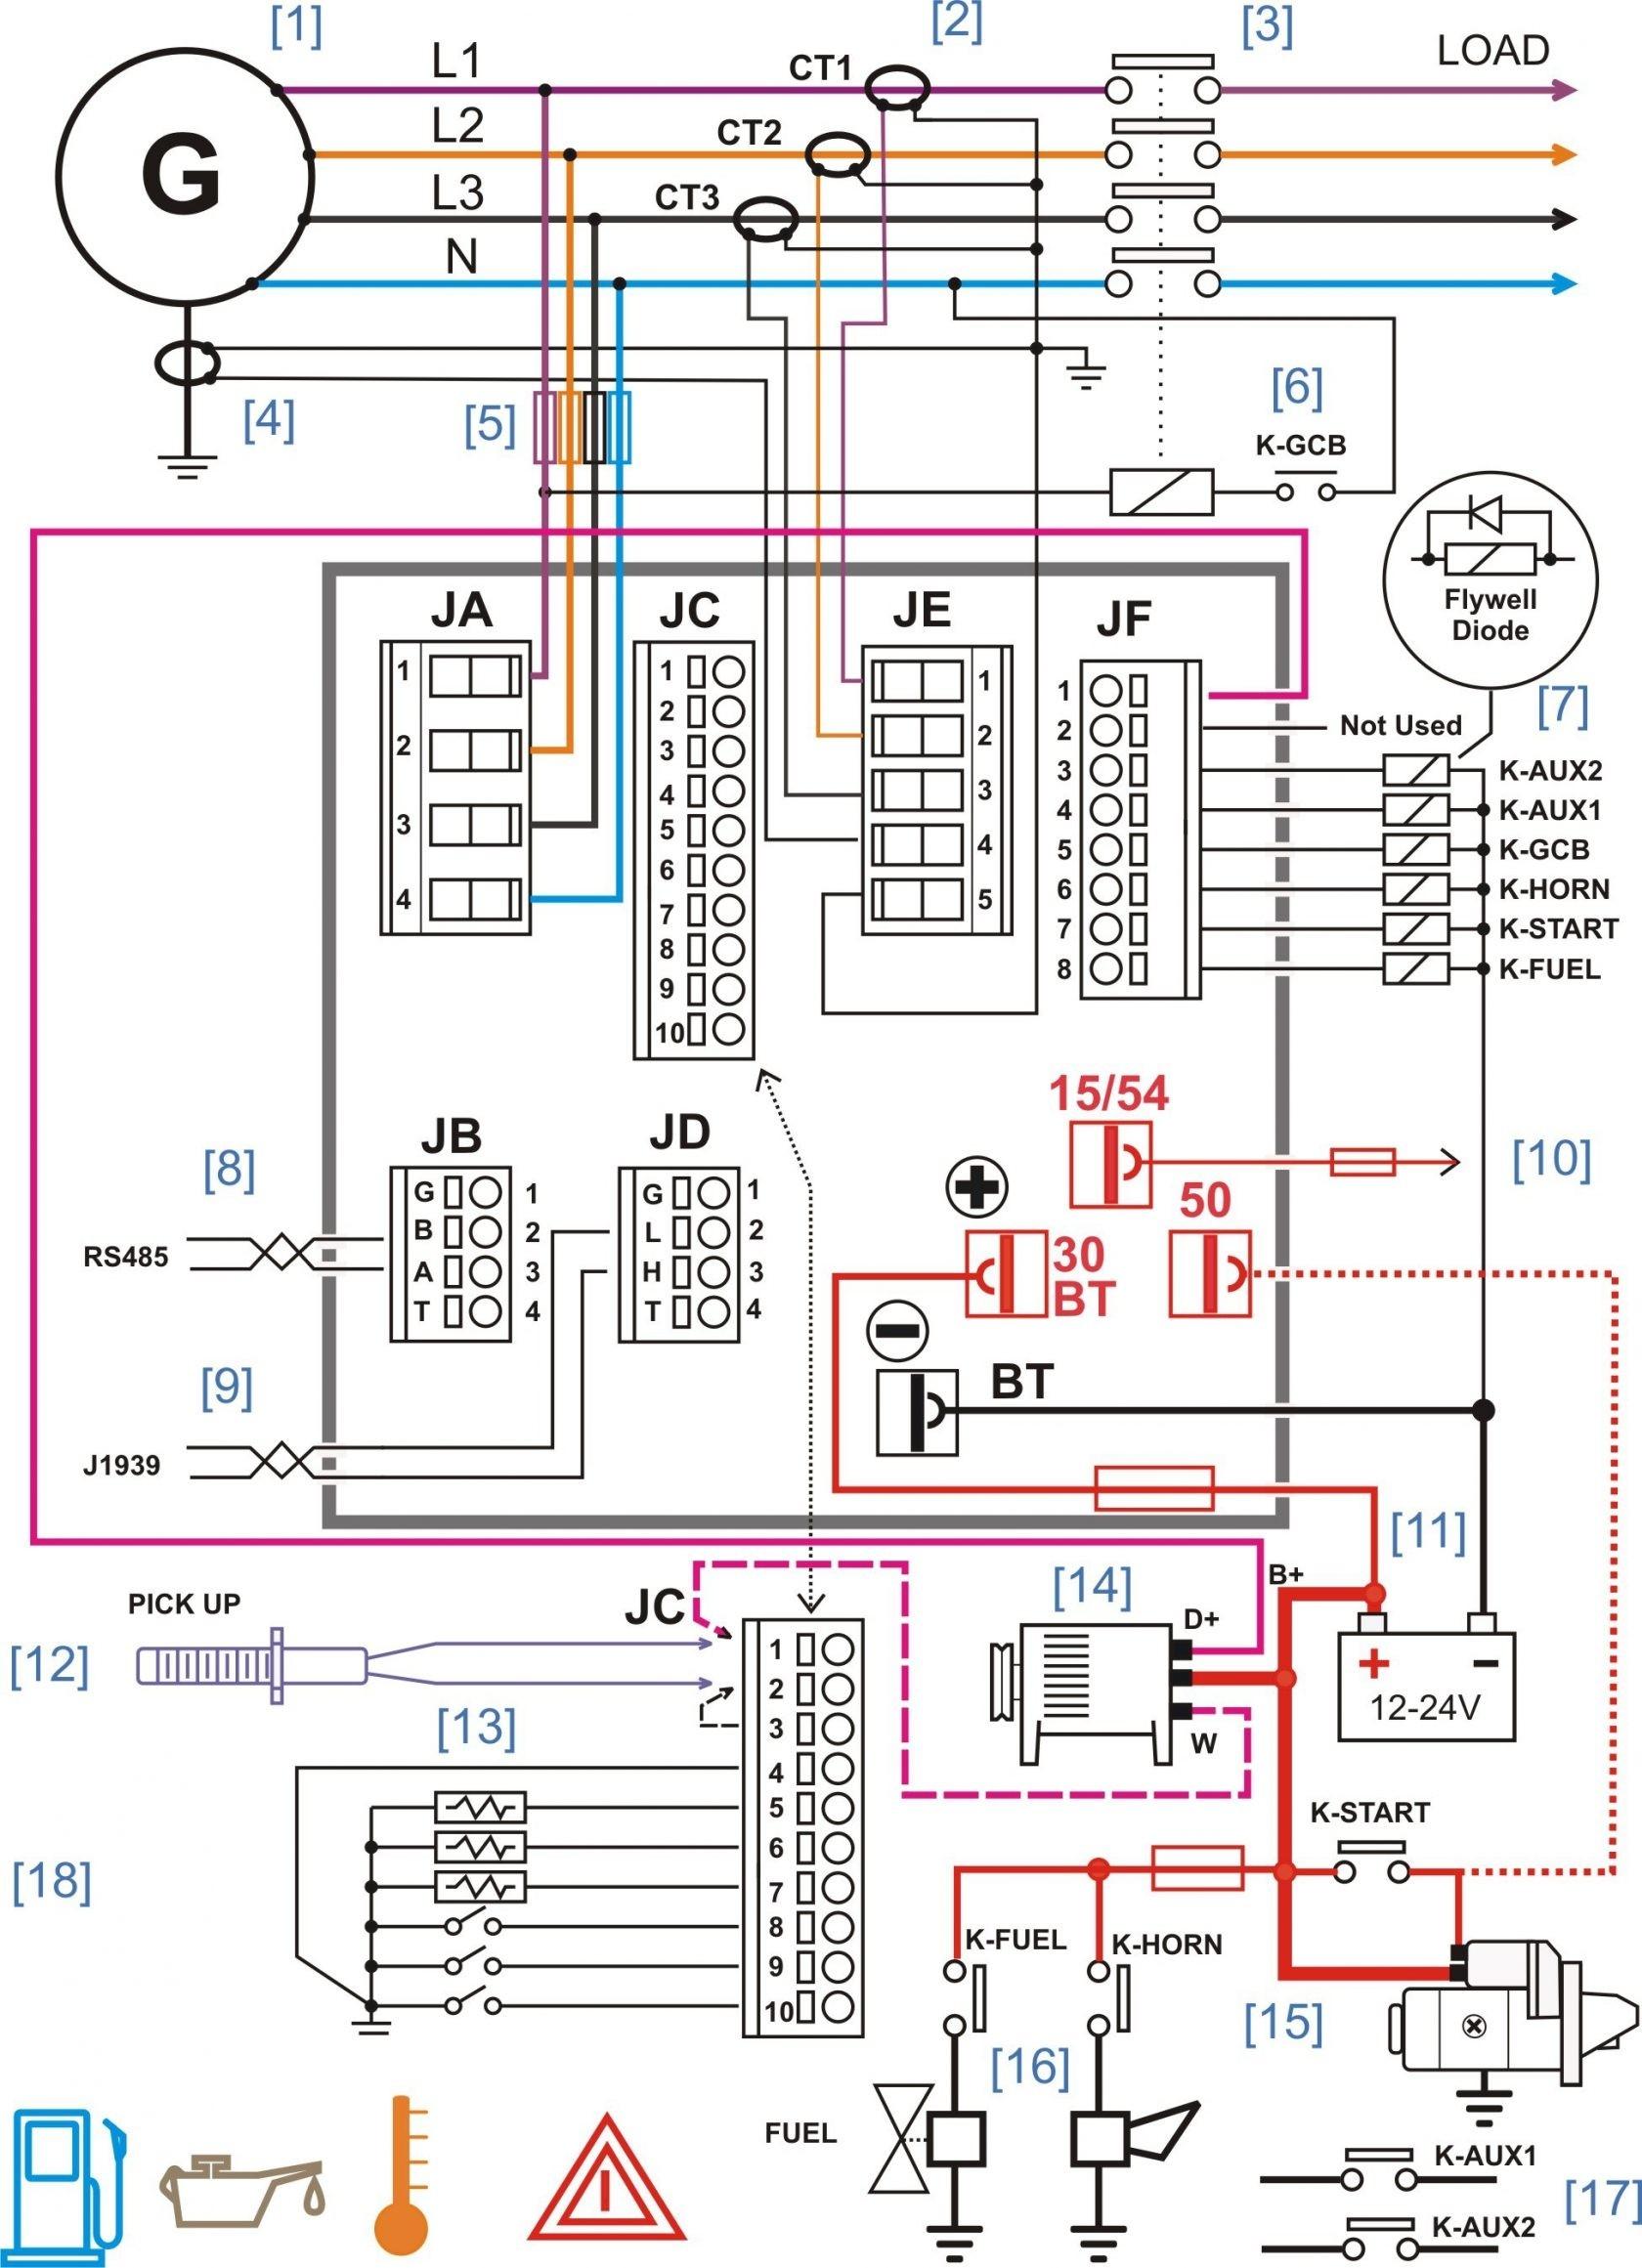 delco model 09354155 wiring diagram wiring diagram datadelco model 16221029 wiring  schematic basic electronics wiring diagram